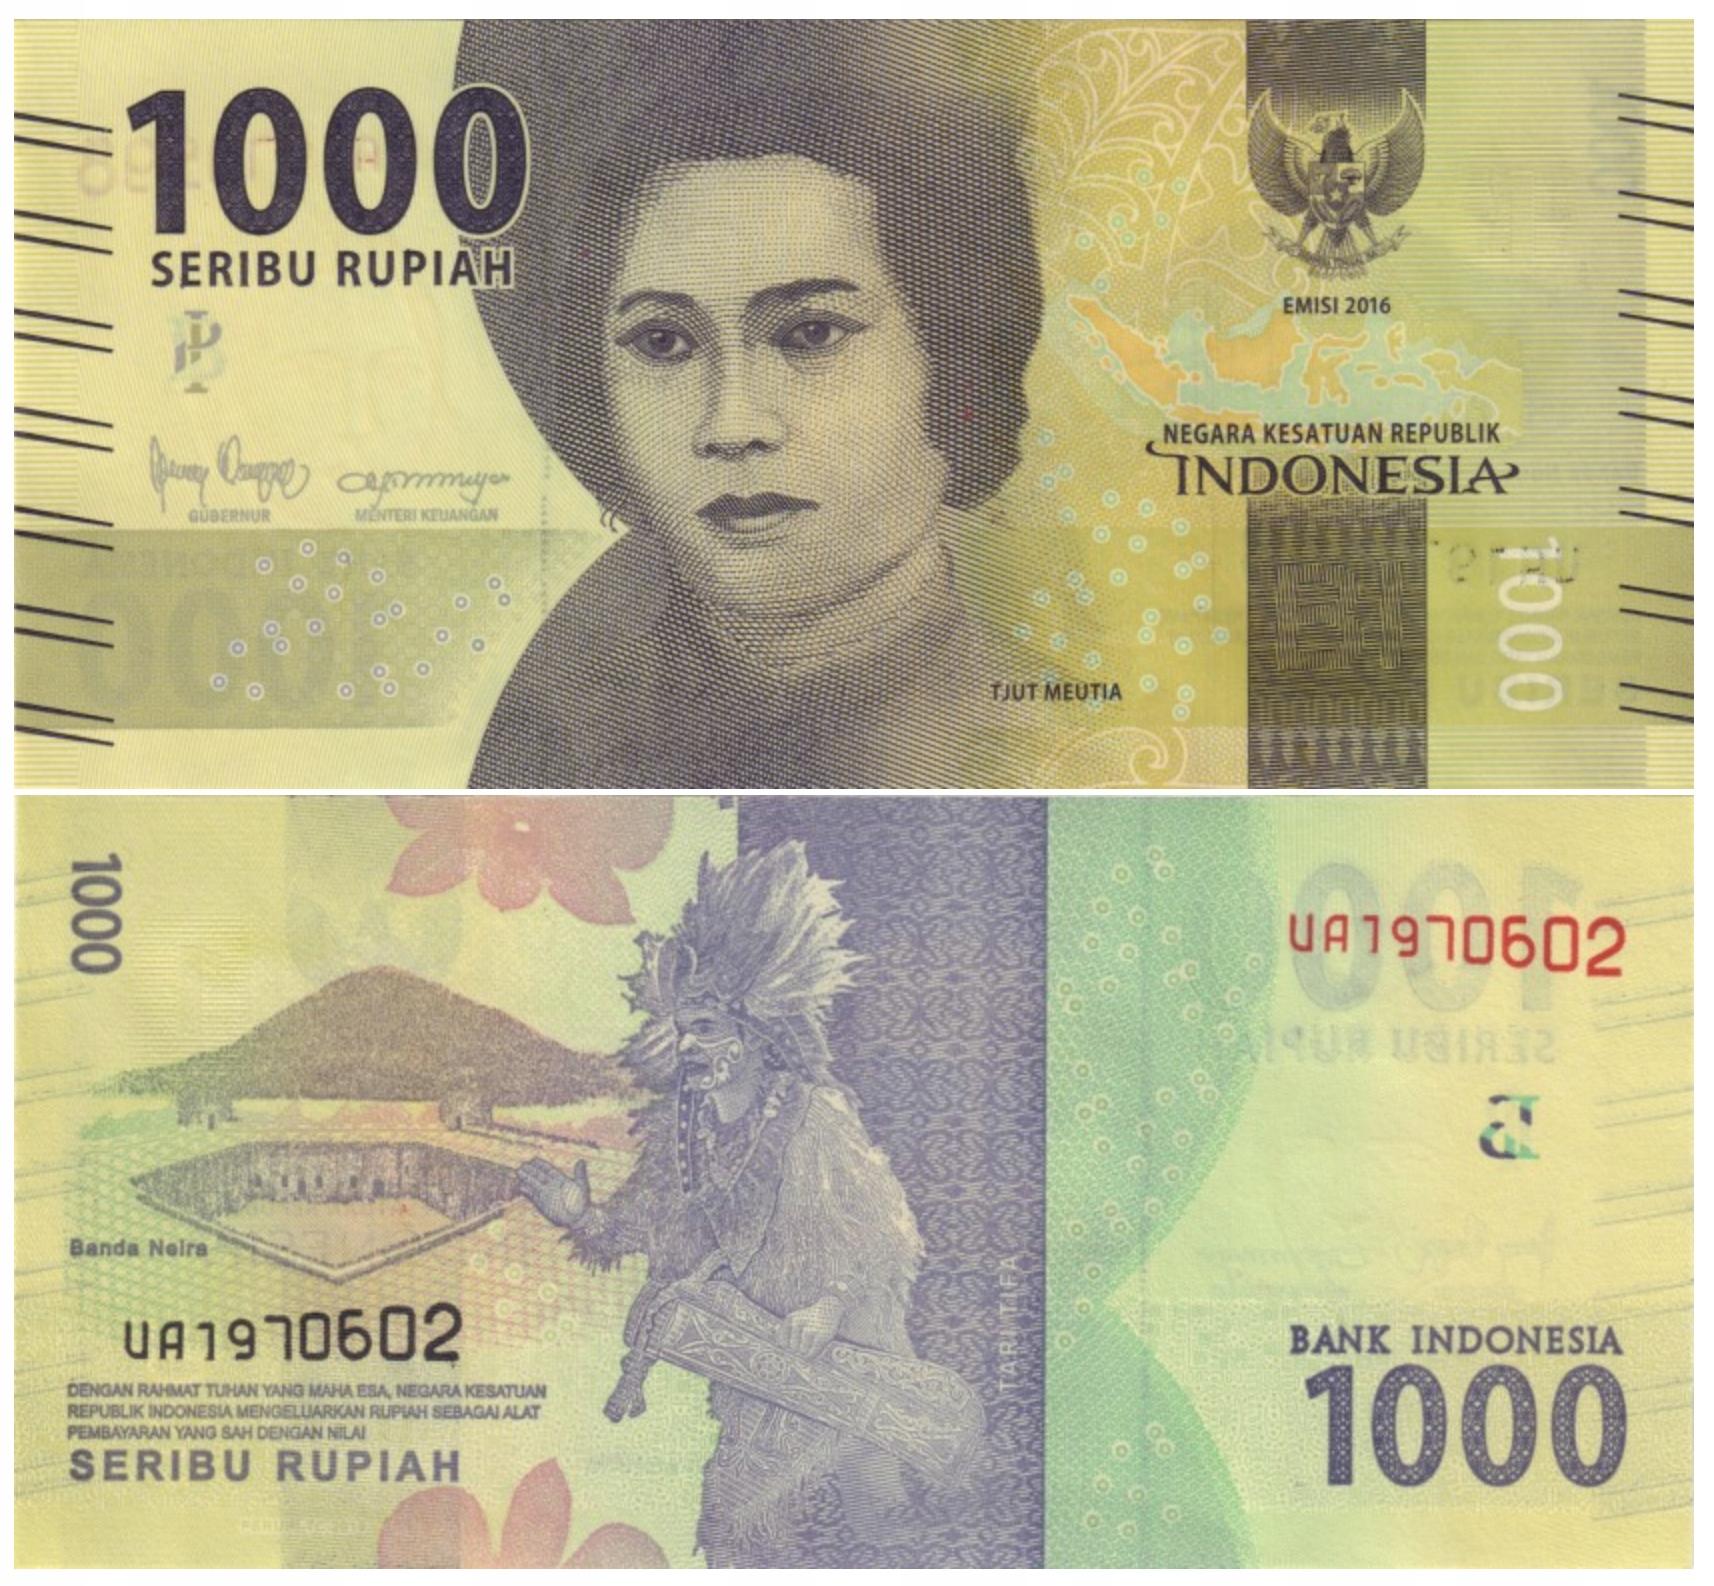 ИНДОНЕЗИЯ 1000 РУП 2016/2019 P-154d UNC